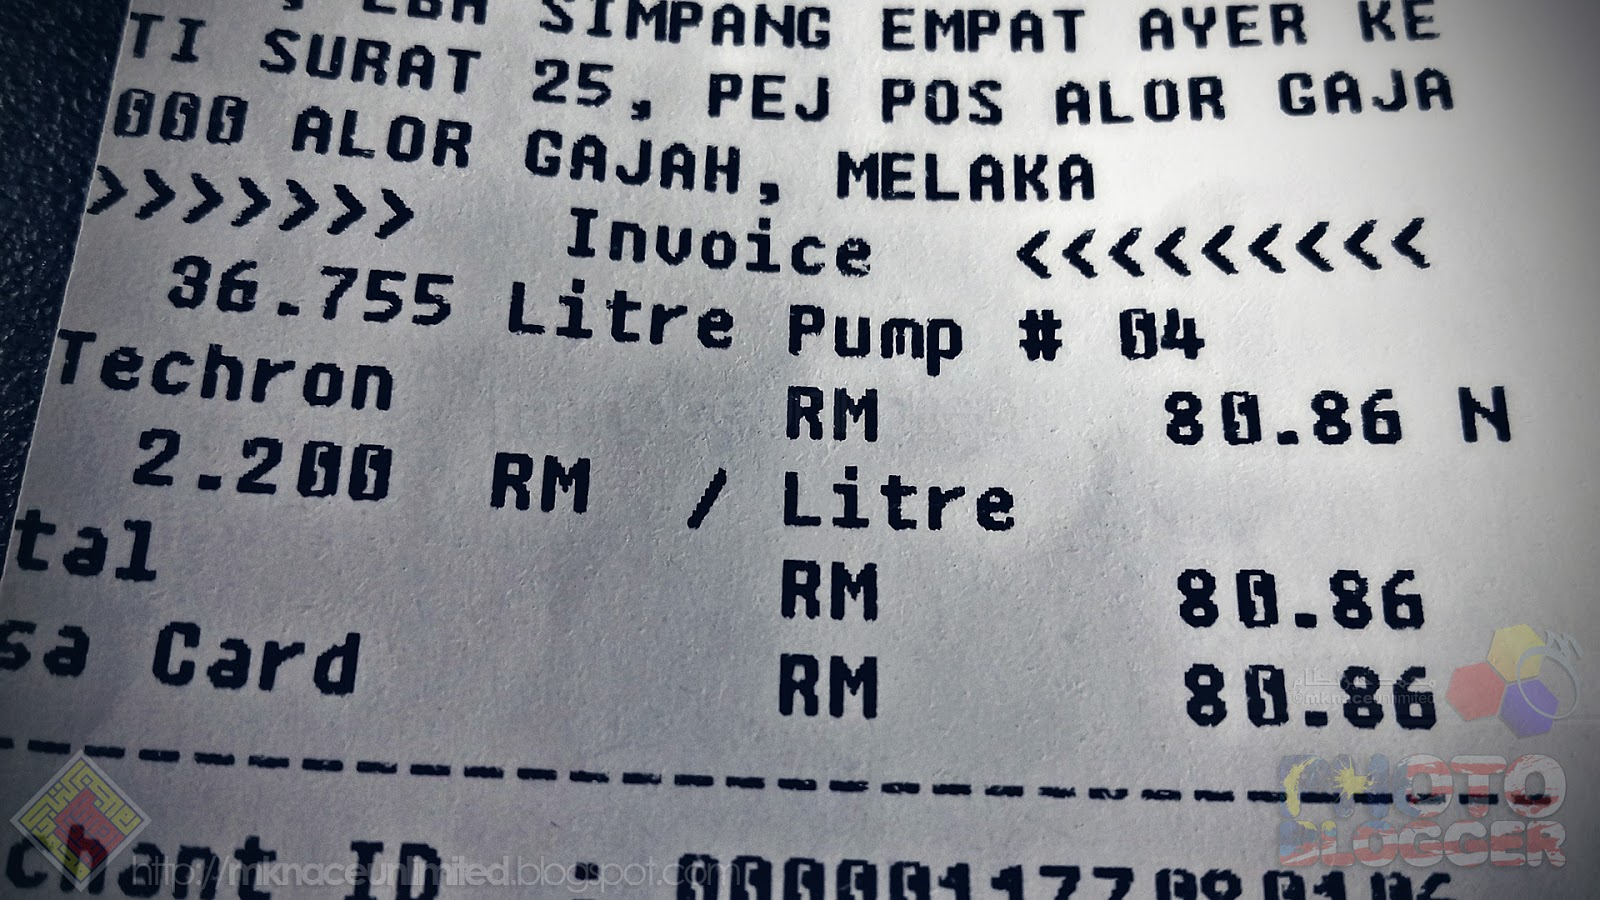 Petrol Routine For Livina Mknace Unlimited The Colours Of Life Roti Tissue By Canai Ikhwan Gh Corner Mks Isi Semula On 13 November Petron Rr Ayer Keroh Way Back From Putrajaya Hasil Rm8086 5540 Km Melibatkan 36755l Minyak 6 Hari